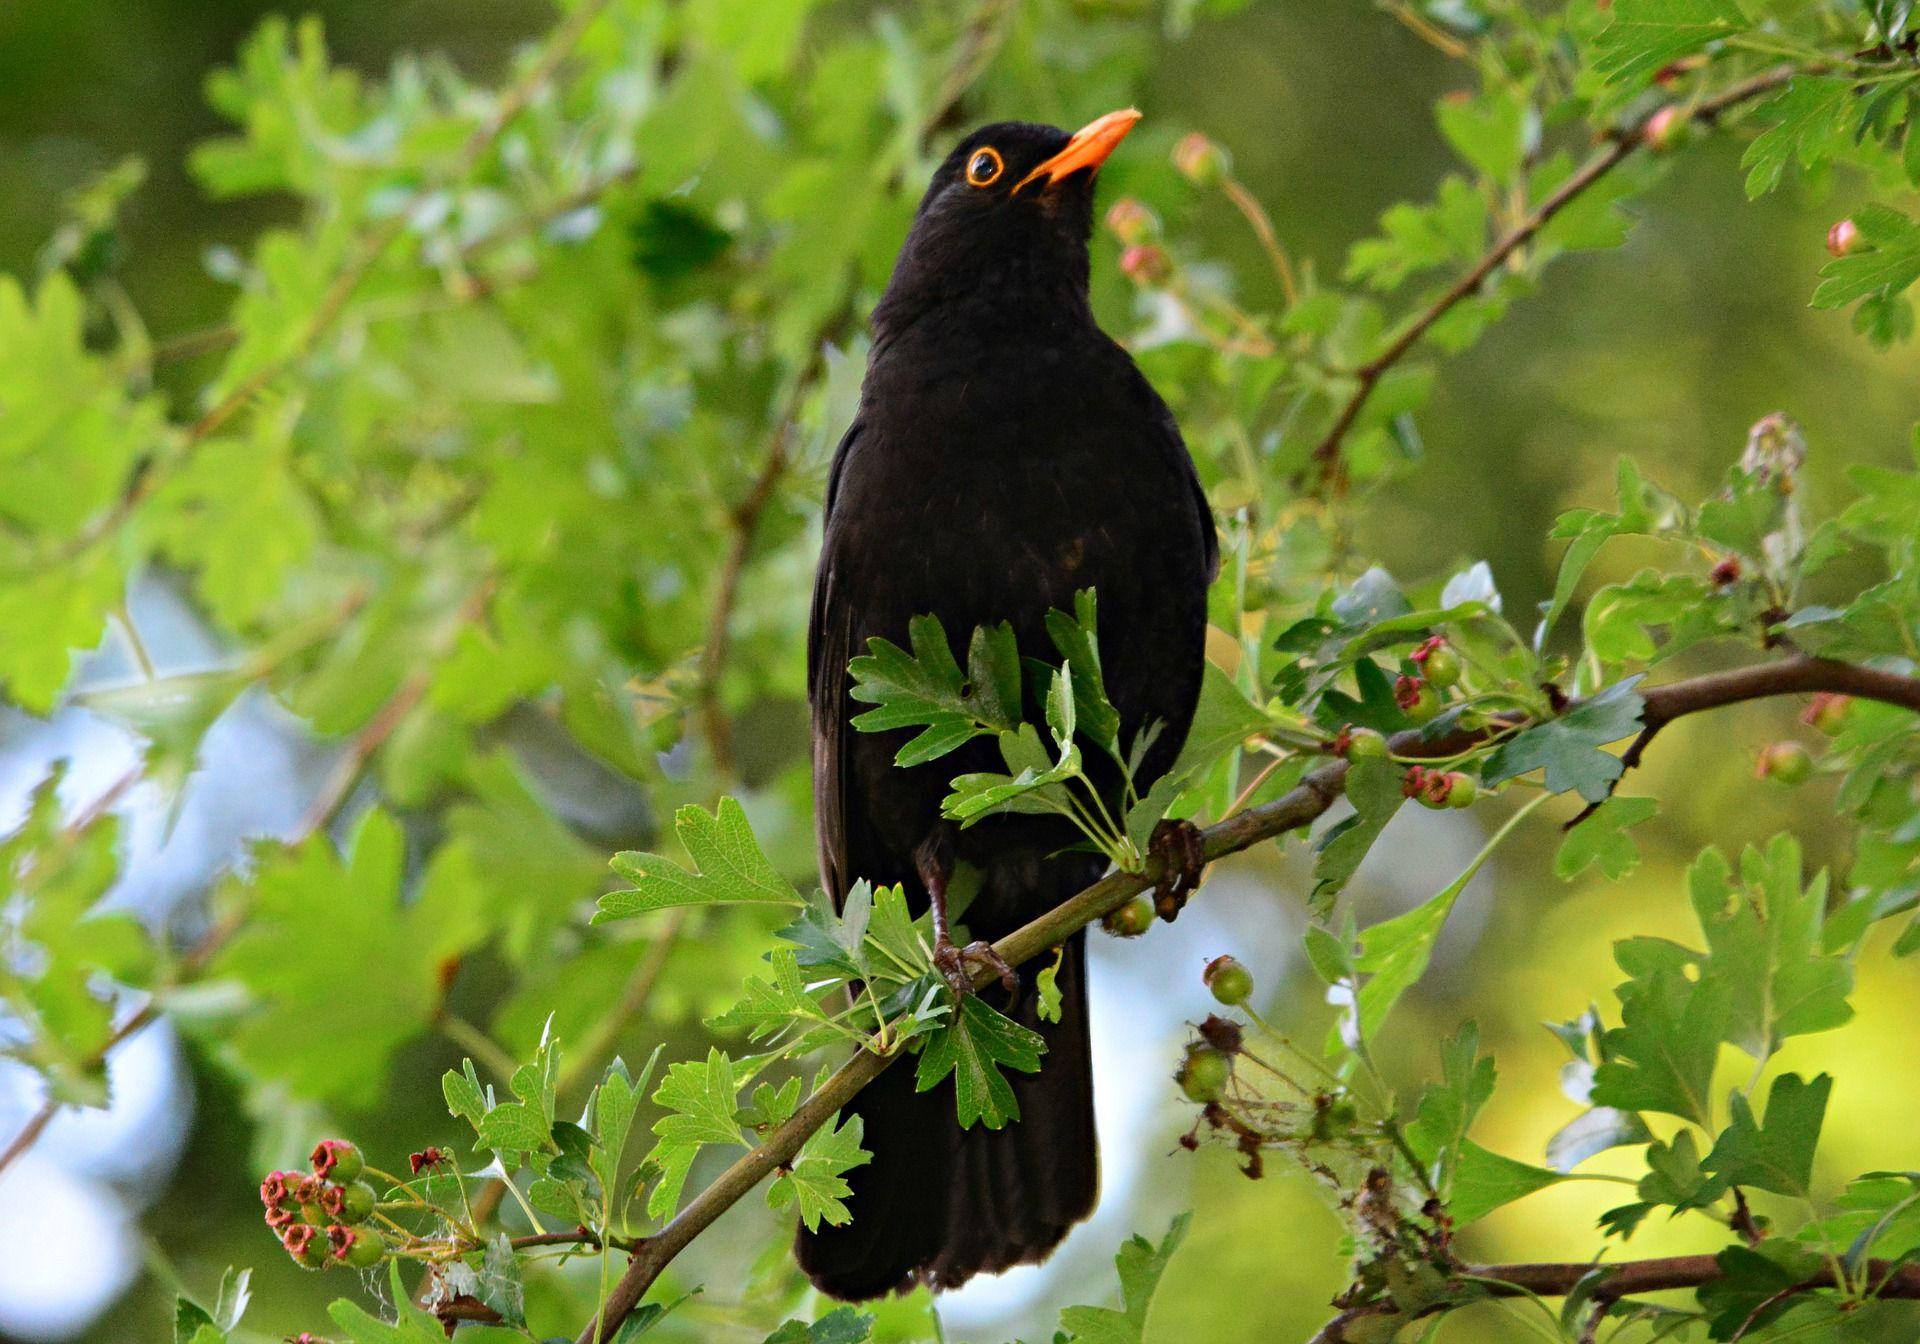 Онлайн просмотр фото черного дрозда